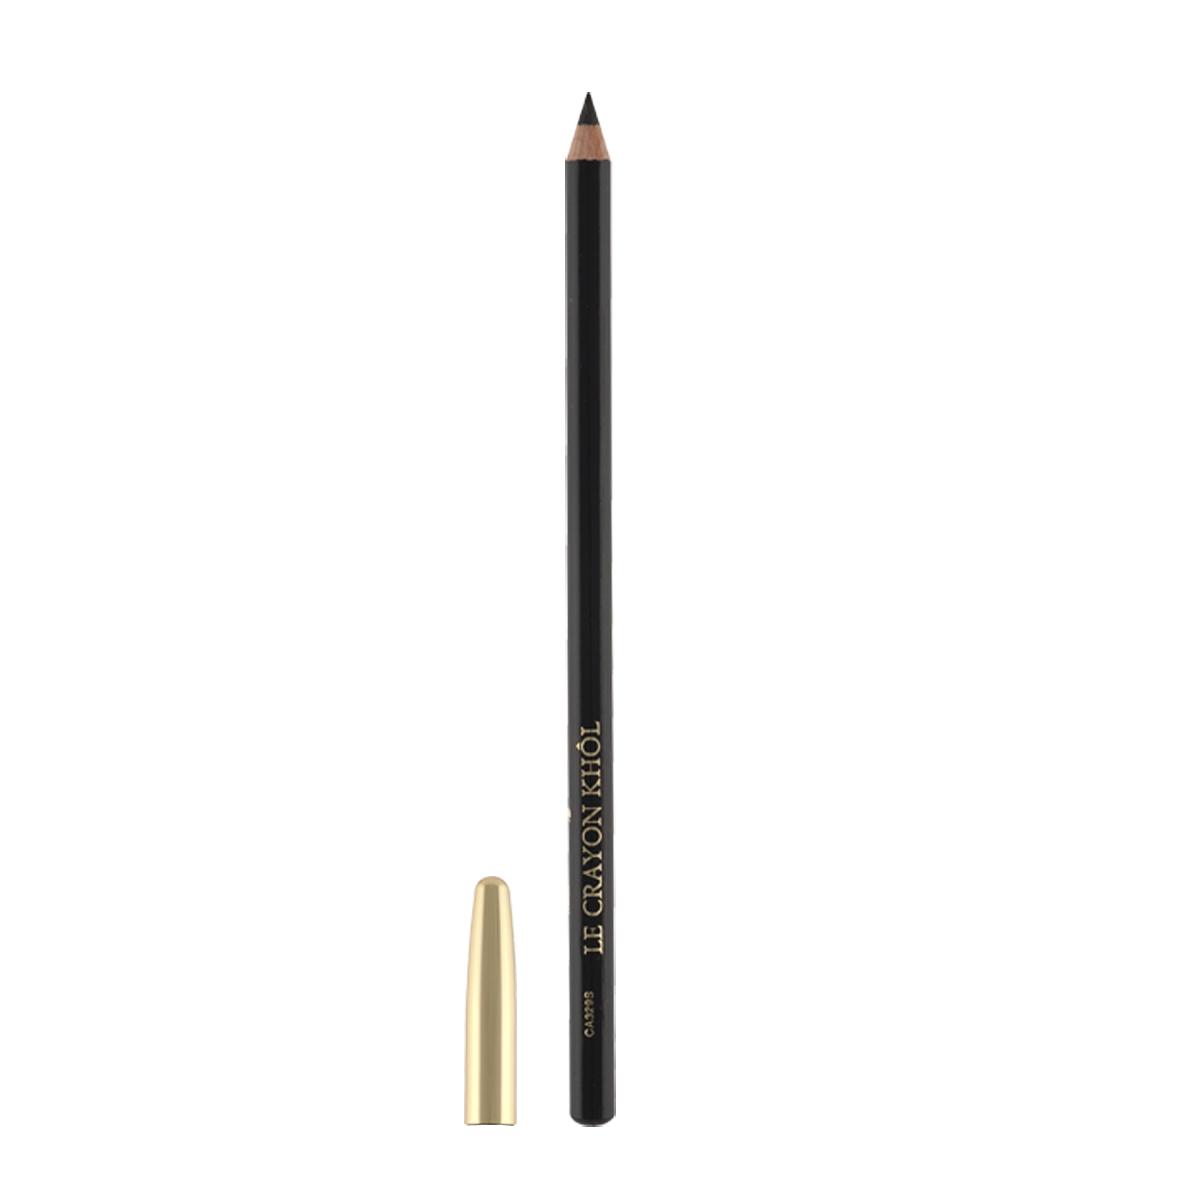 Lancôme - Crayon Khôl